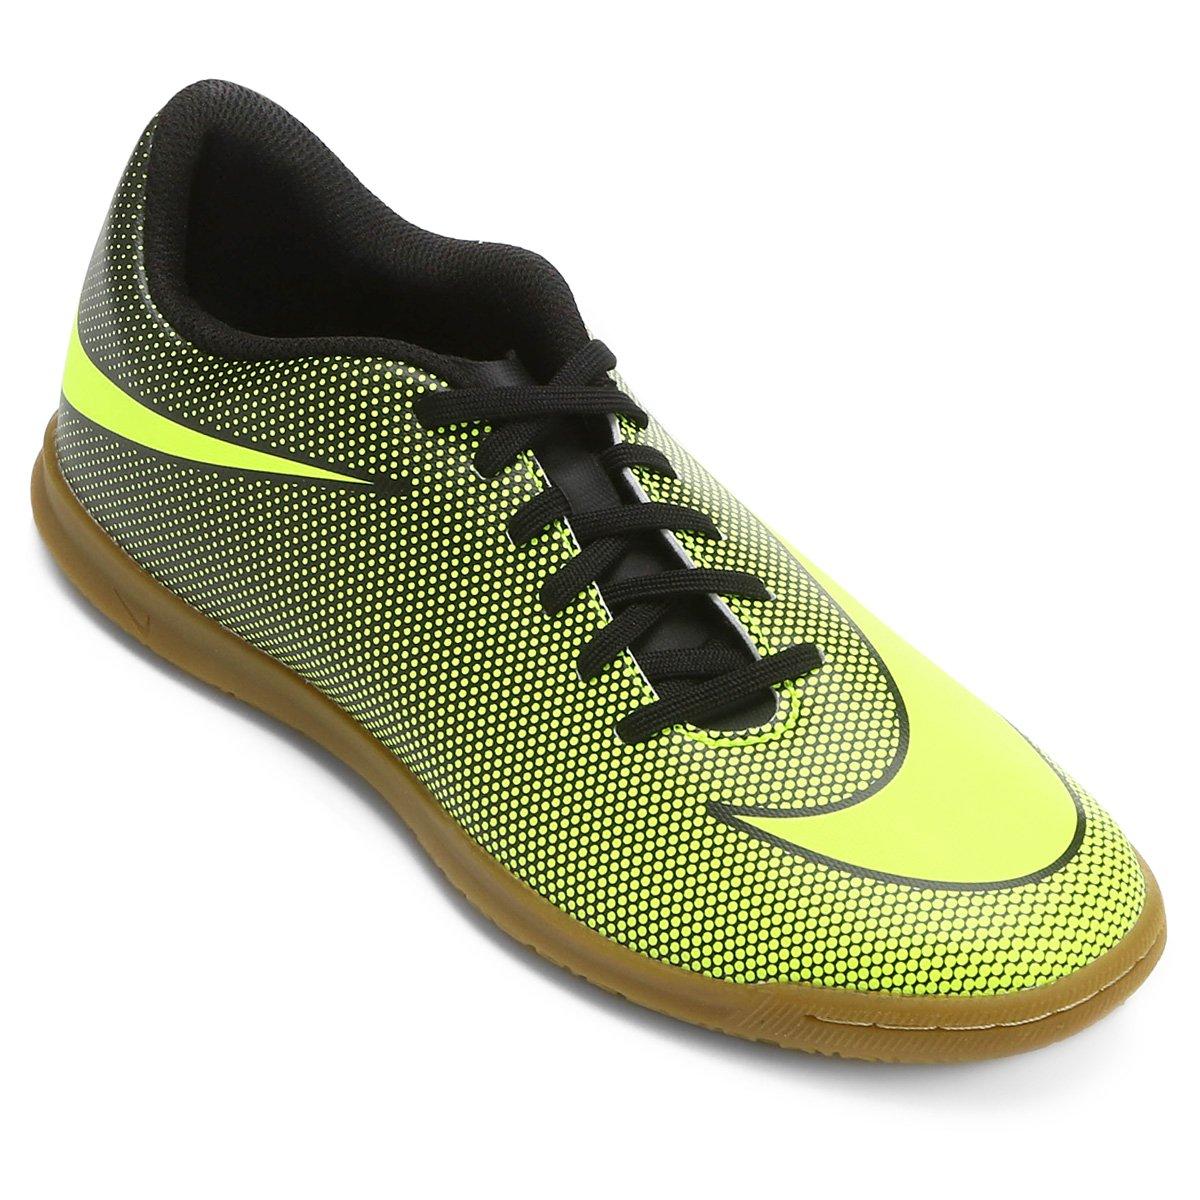 Chuteira Futsal Nike Bravata 2 IC - Preto e Amarelo - Compre Agora ... 905d7a173e14d